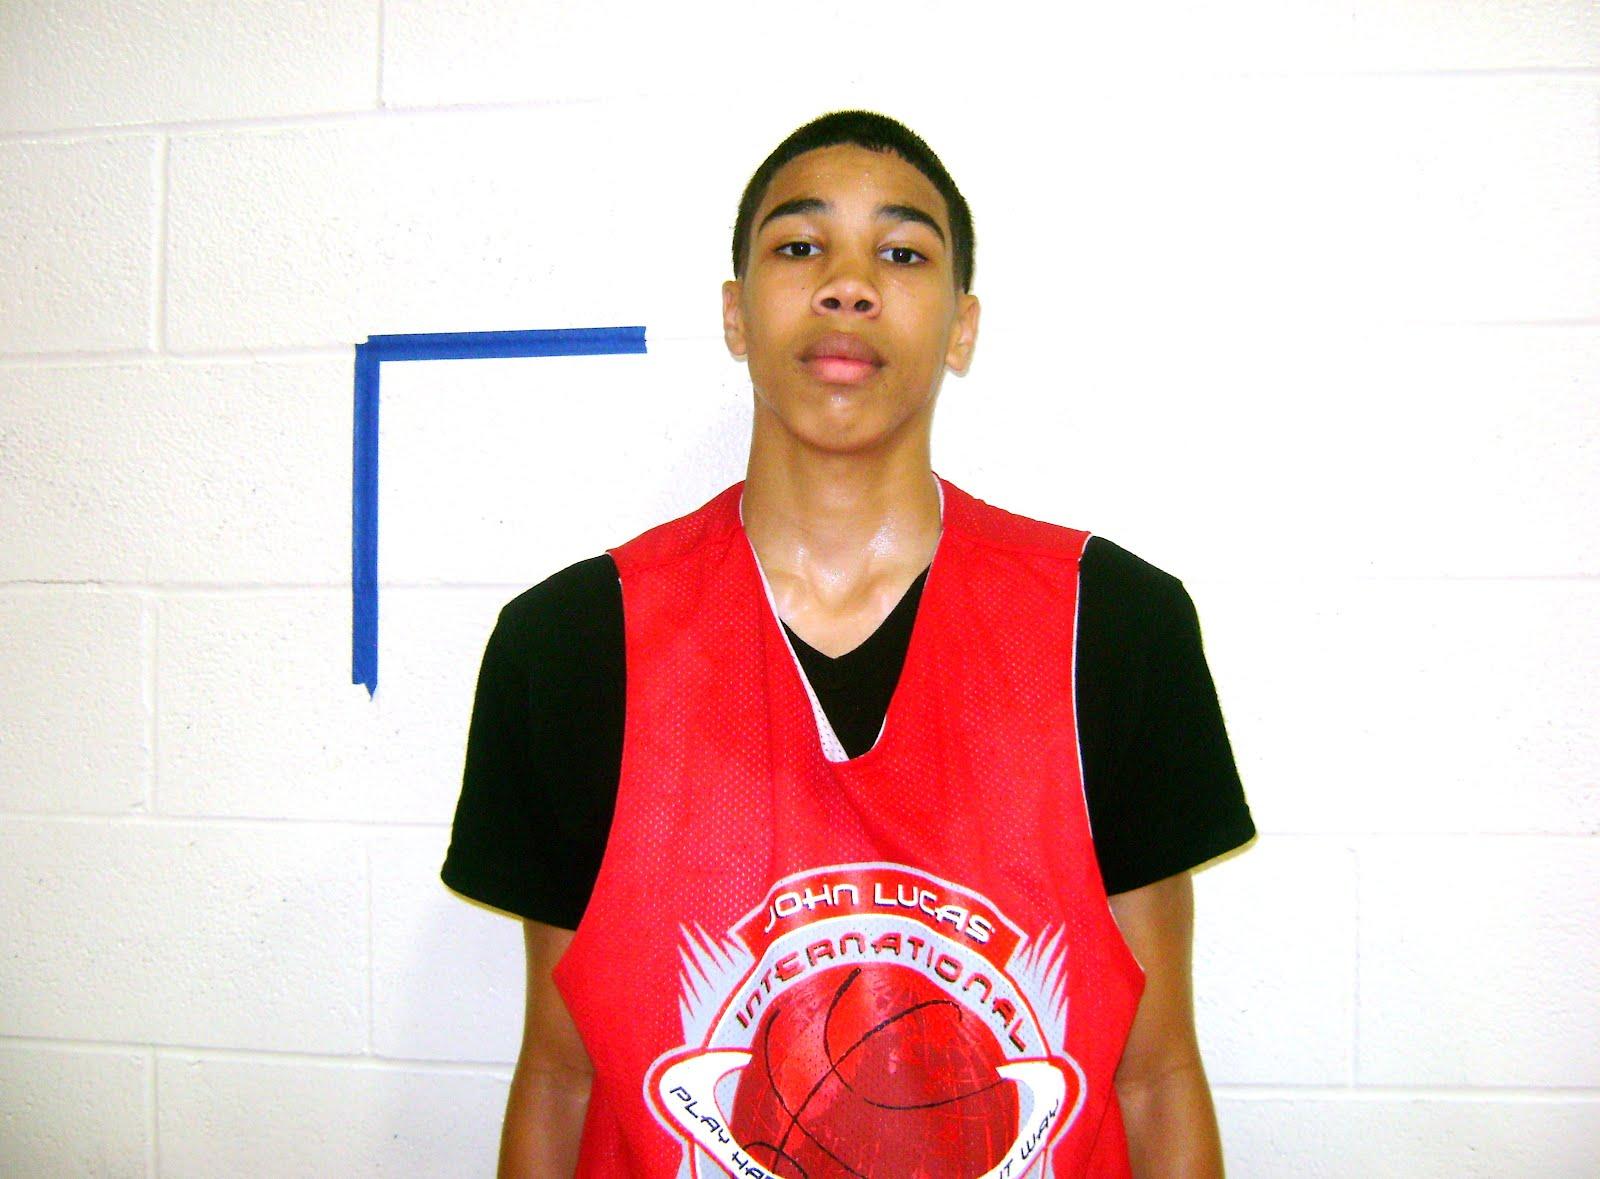 ... SPOTLIGHT NEWS: Player Profile: Jayson Tatum (St. Louis, MO